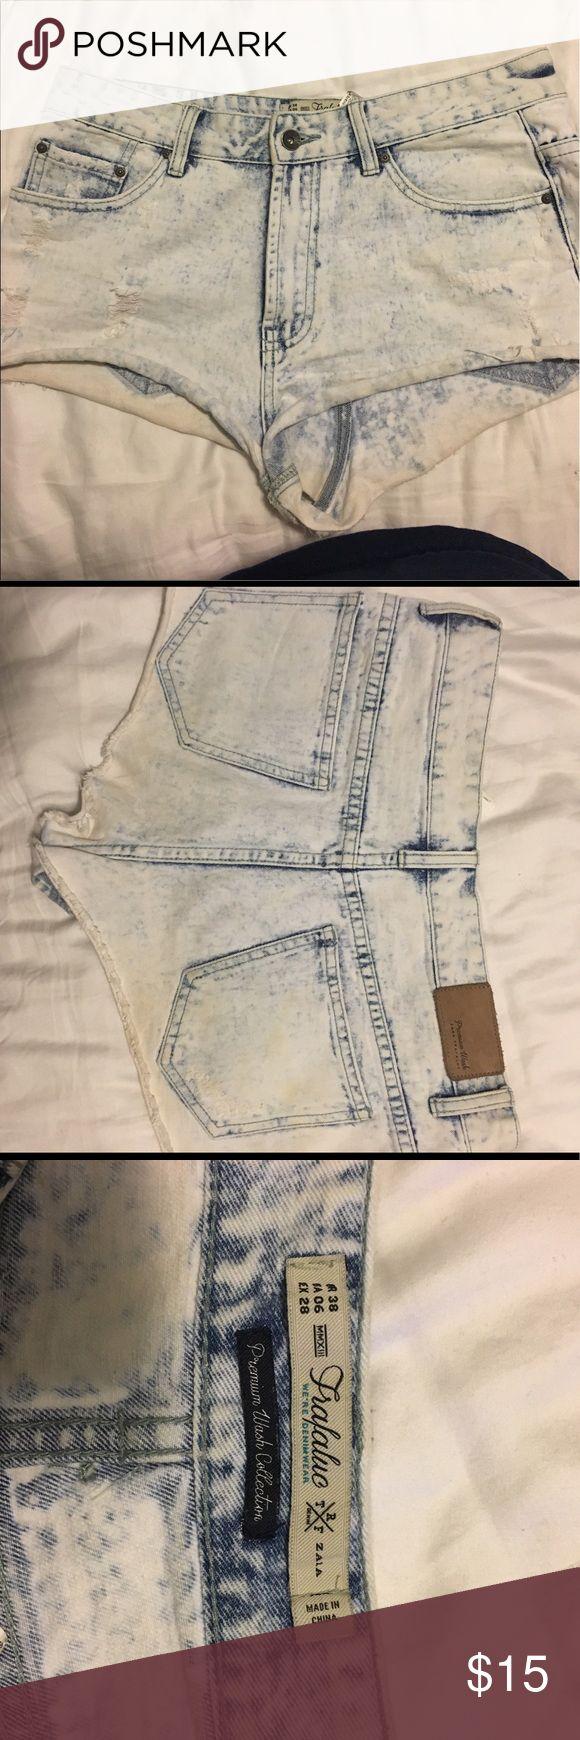 Zara Jean shorts Zara faded Cutoff Jean Shorts Zara Shorts Jean Shorts